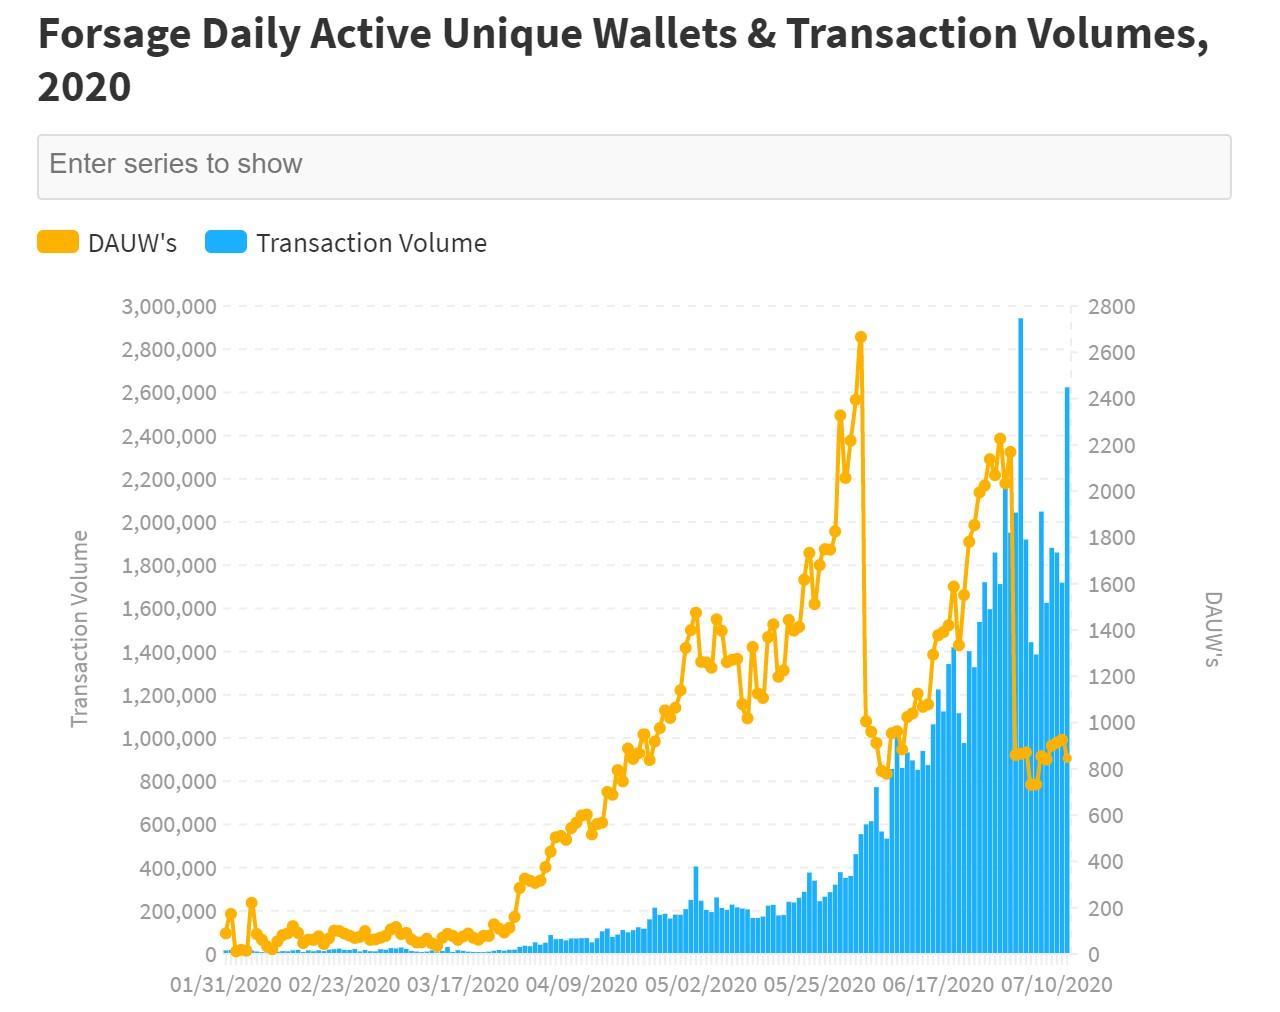 Forsage 每日活跃钱包总量与交易量分析图